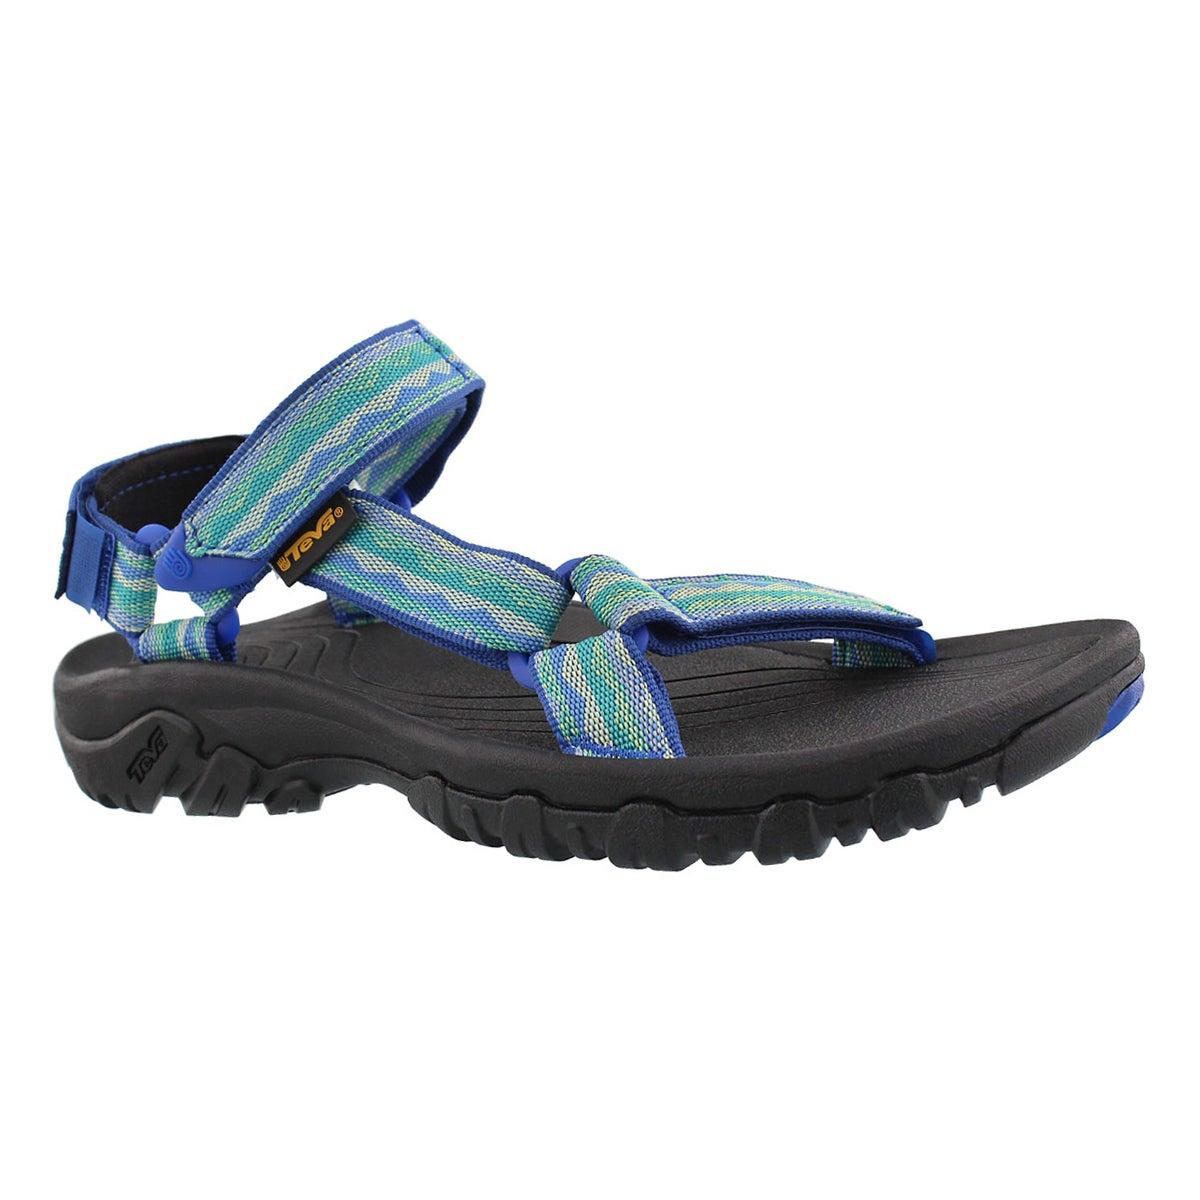 Women's HURRICANE XLT lago blue sport sandals